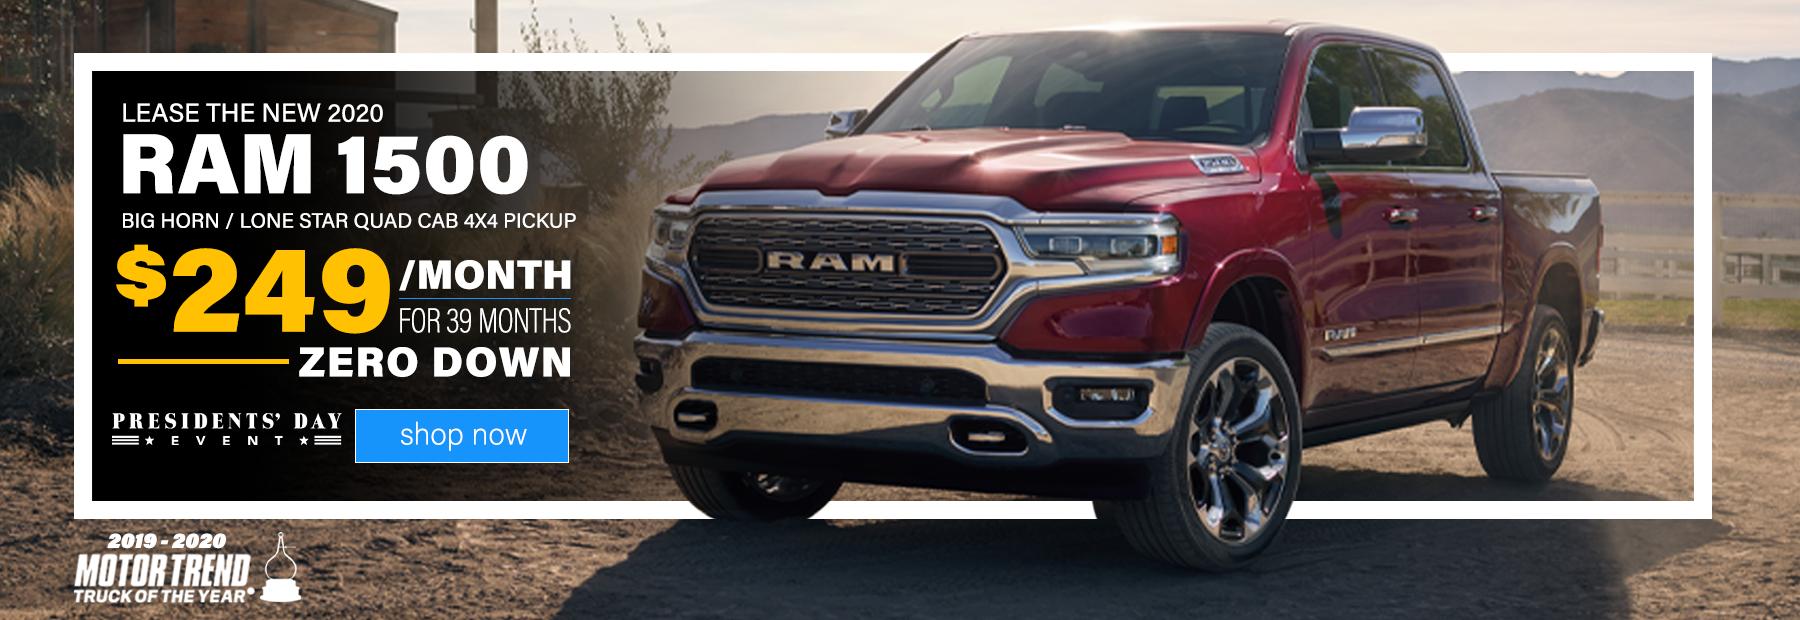 2020-ram-1500-quad-cab-performance-centerville-dayton-ohio